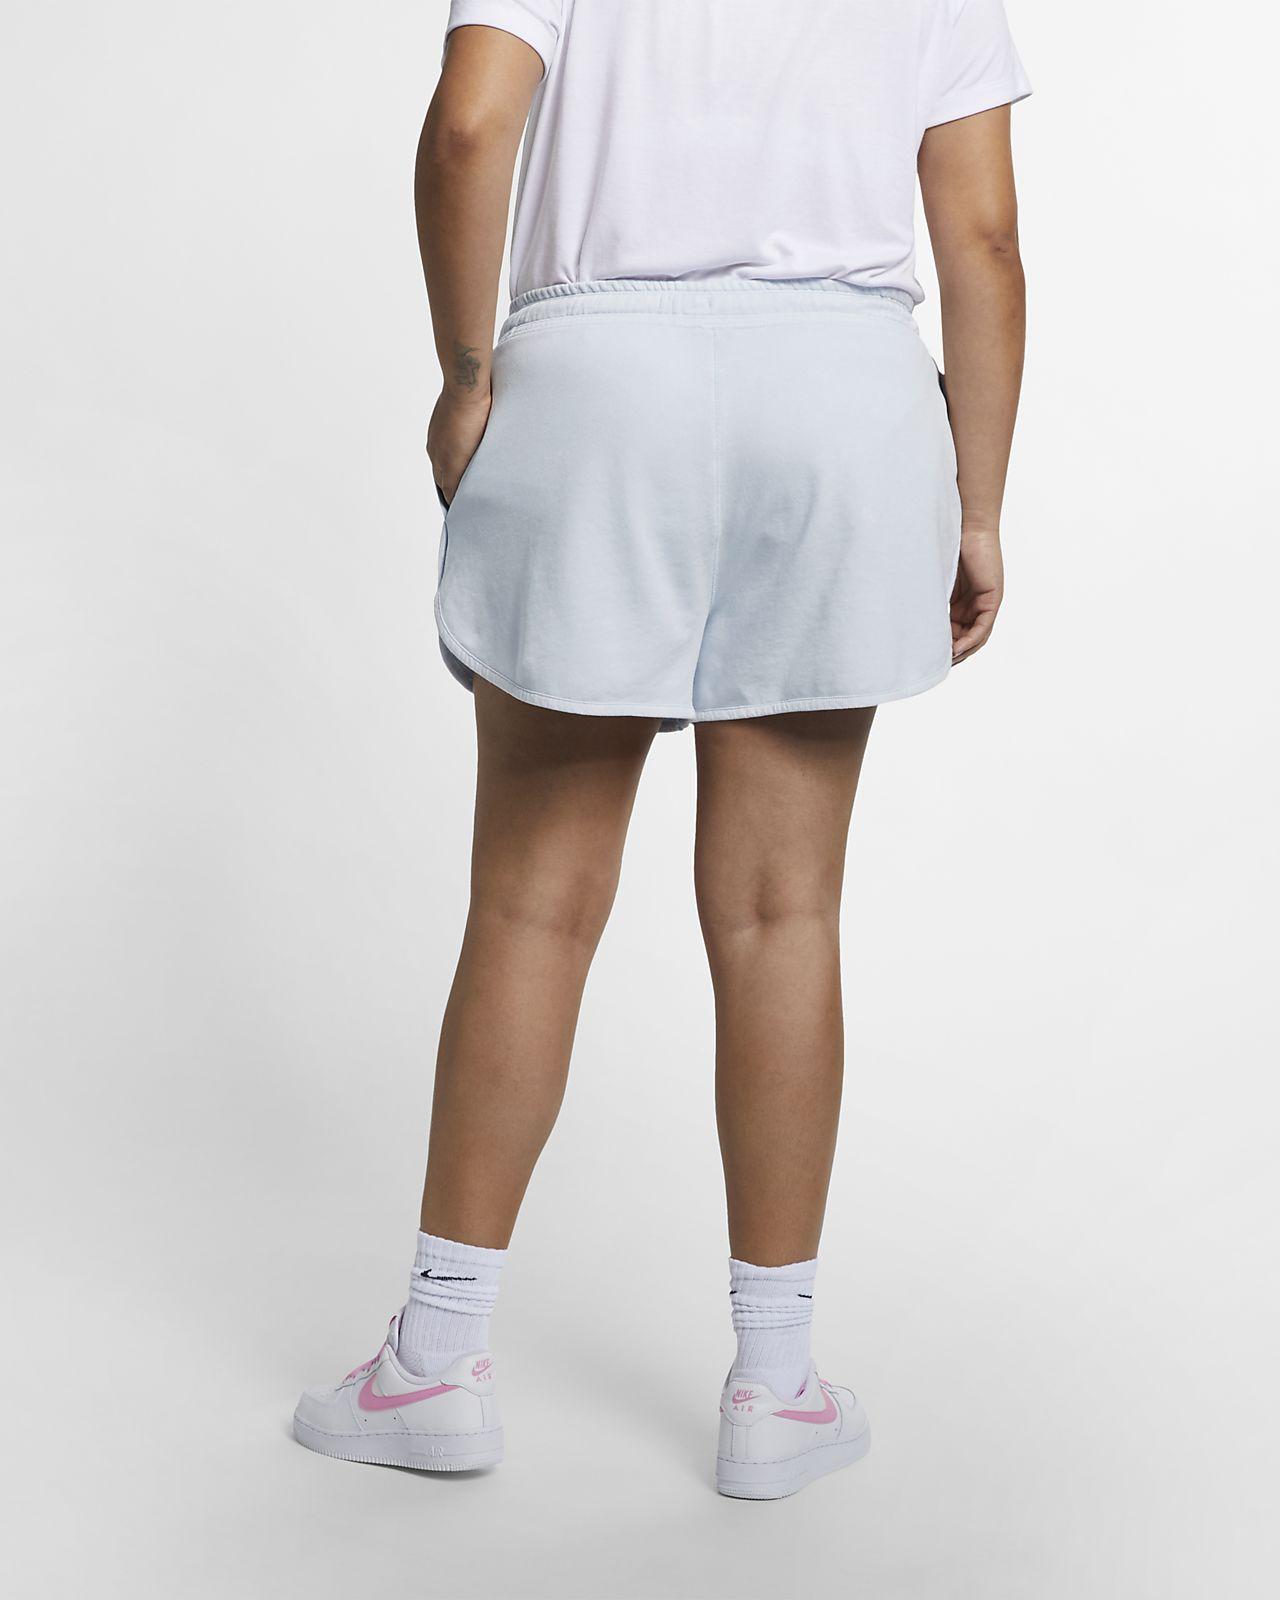 separation shoes f7a6d a4d49 ... Nike Sportswear Women s Shorts (Plus Size)